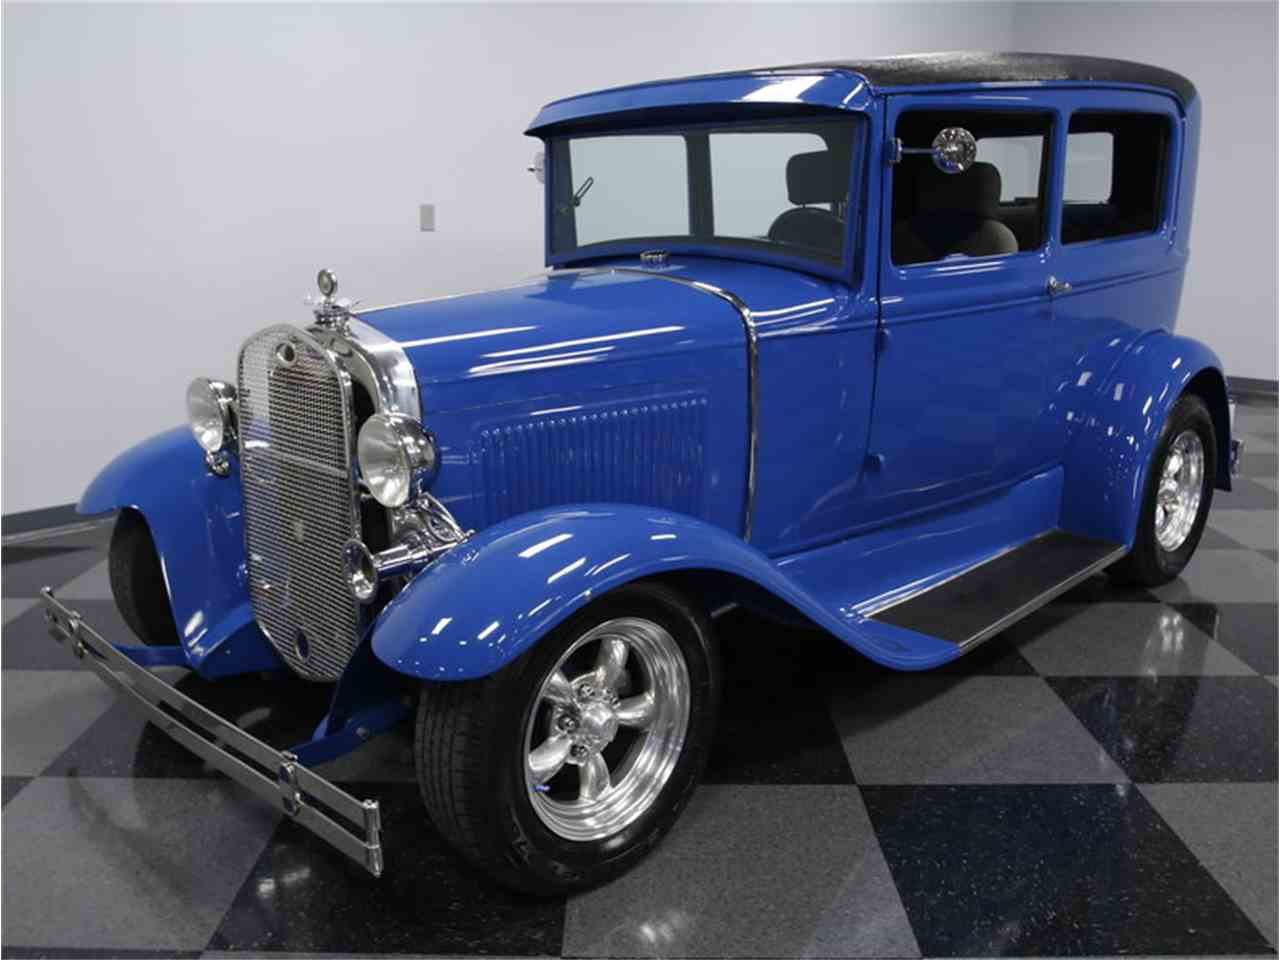 1930 Ford Model A Street Rod for Sale | ClassicCars.com | CC-925627